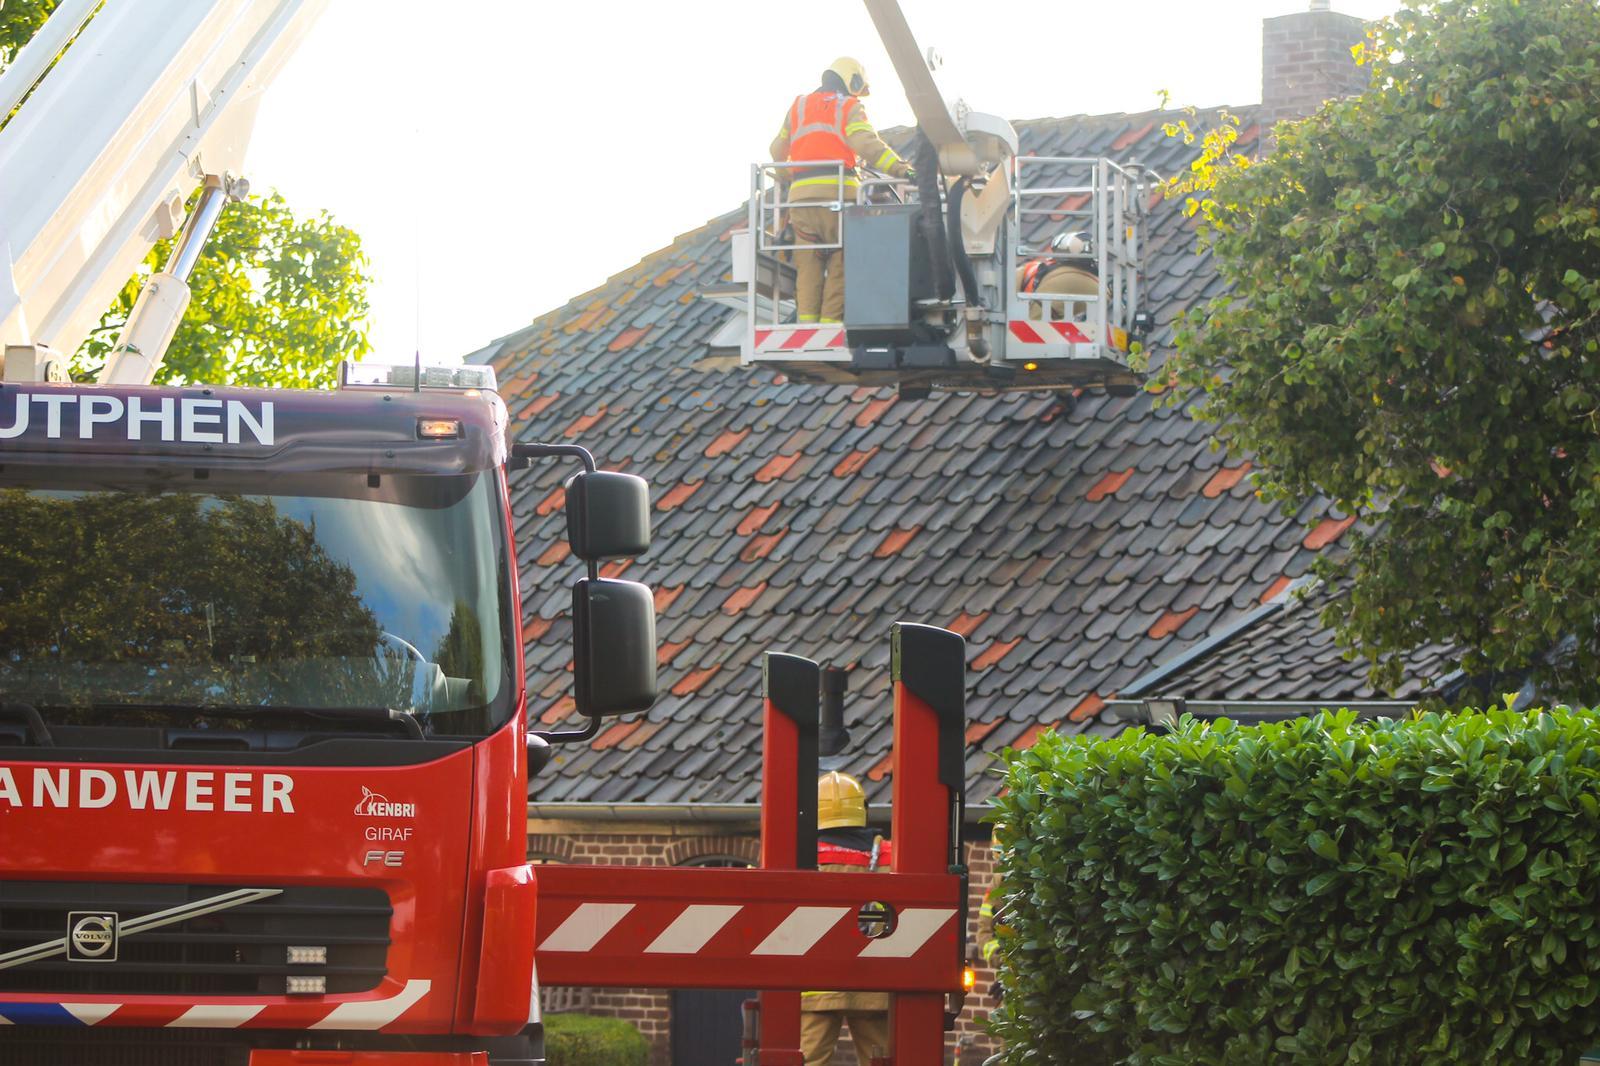 Woningbrand aan Hoogstraat in Toldijk; oorzaak onbekend